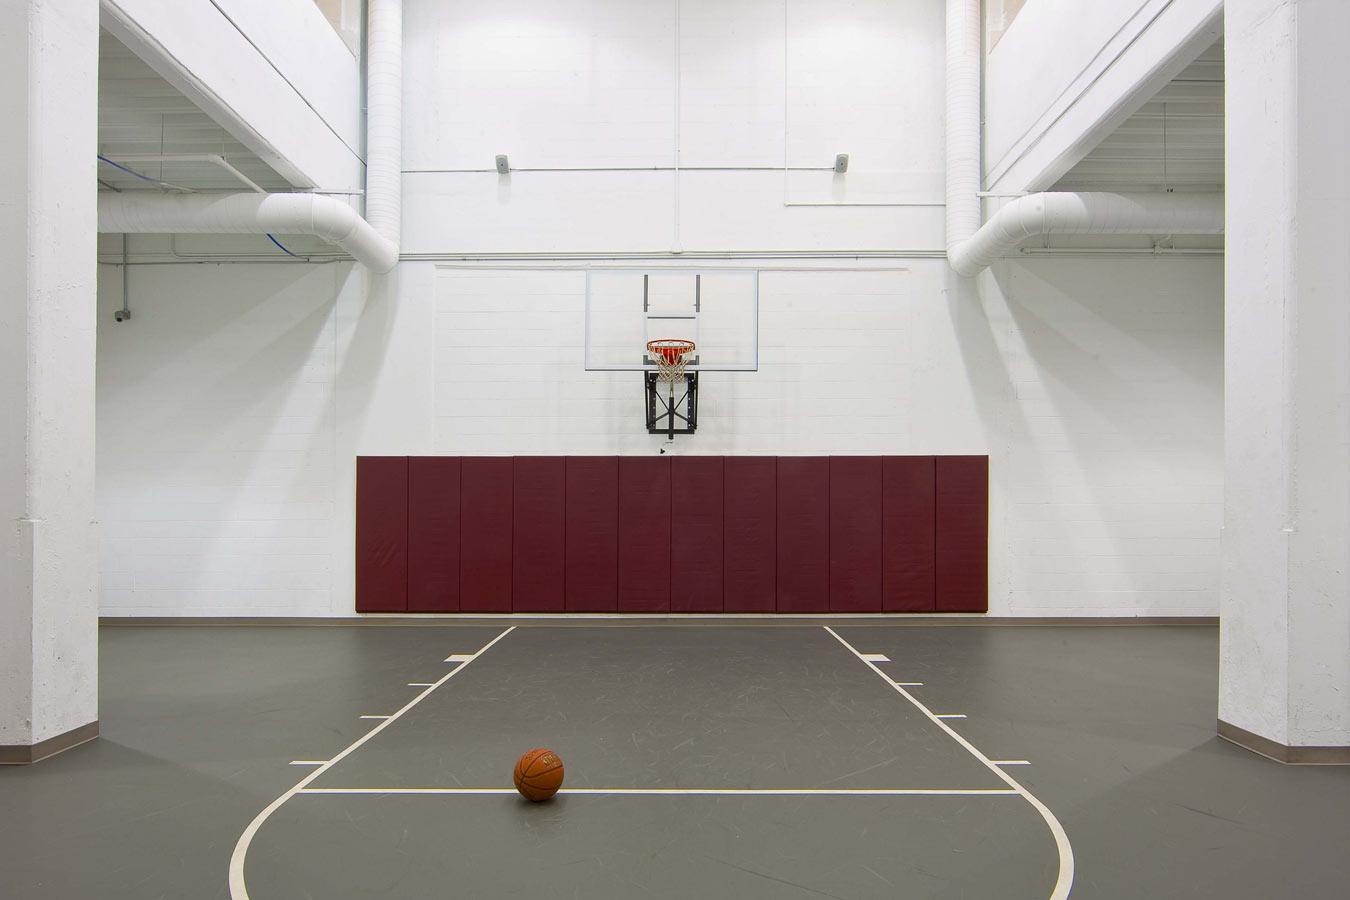 8---CANCOlofts---BALL-COURT.jpg